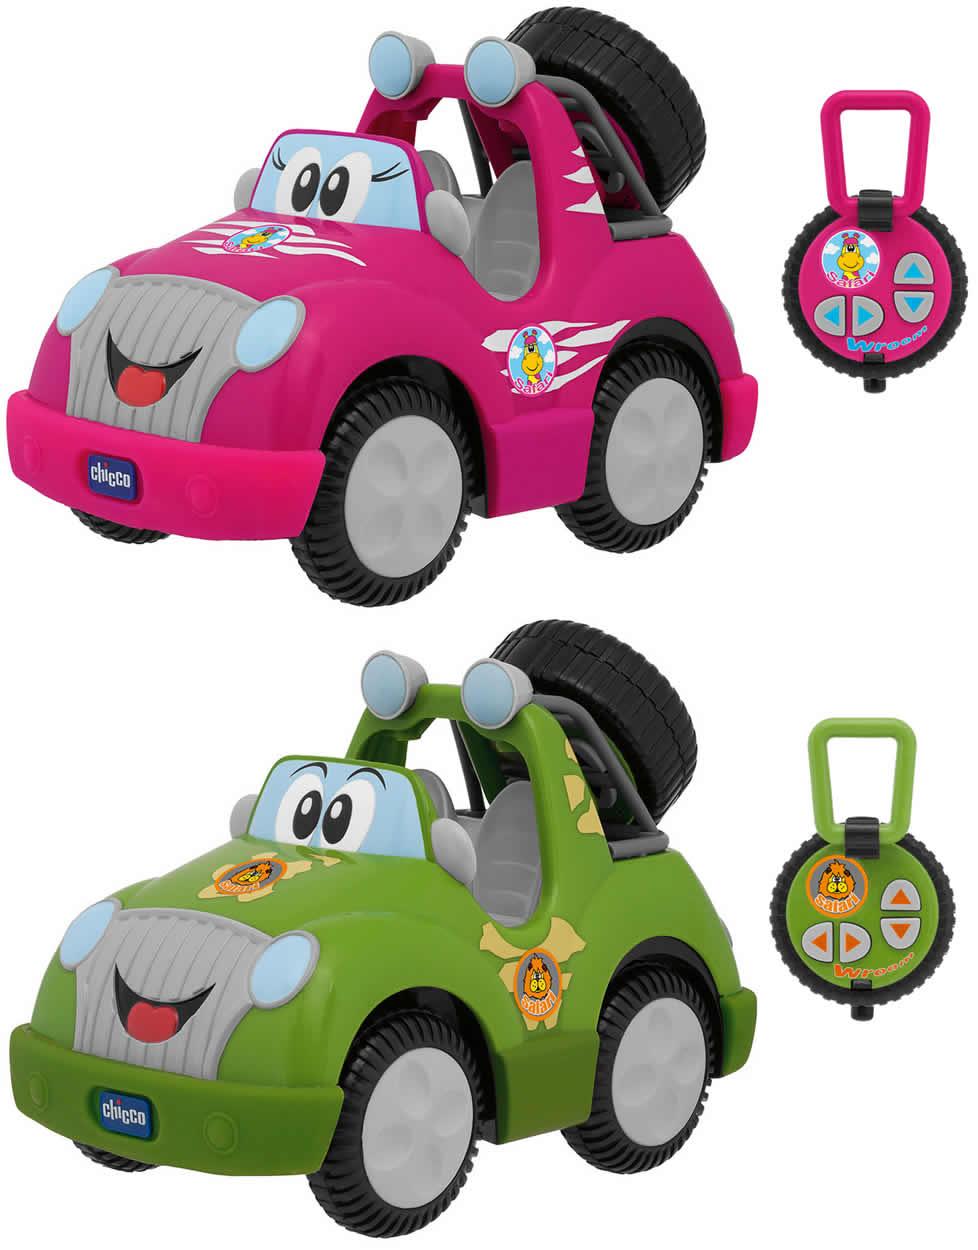 chicco safari park rc gr n o pink ferngesteuertes auto. Black Bedroom Furniture Sets. Home Design Ideas